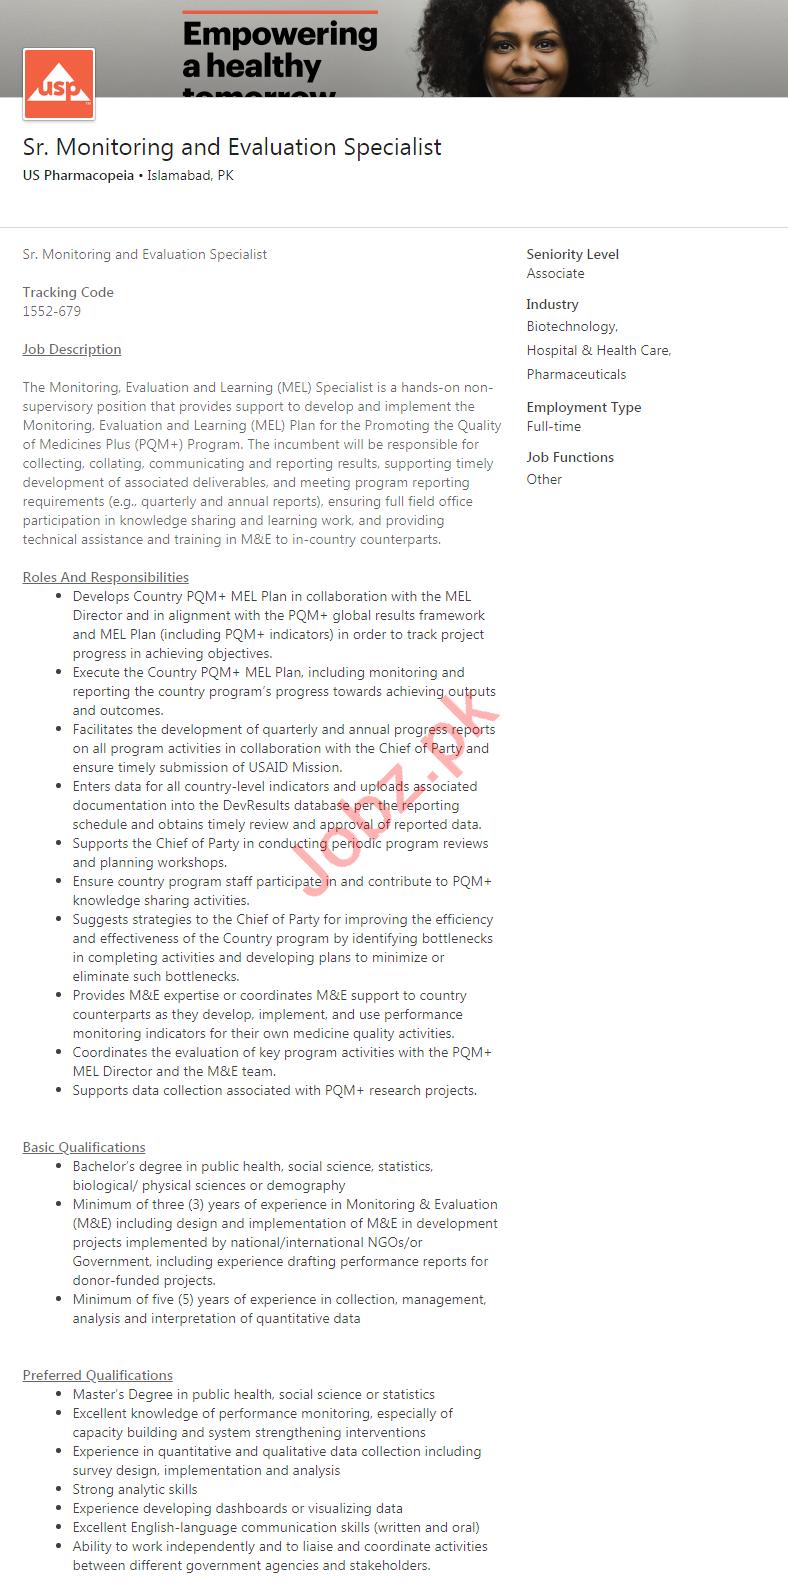 US Pharmacopeia Islamabad Jobs 2020 for M&E Specialist